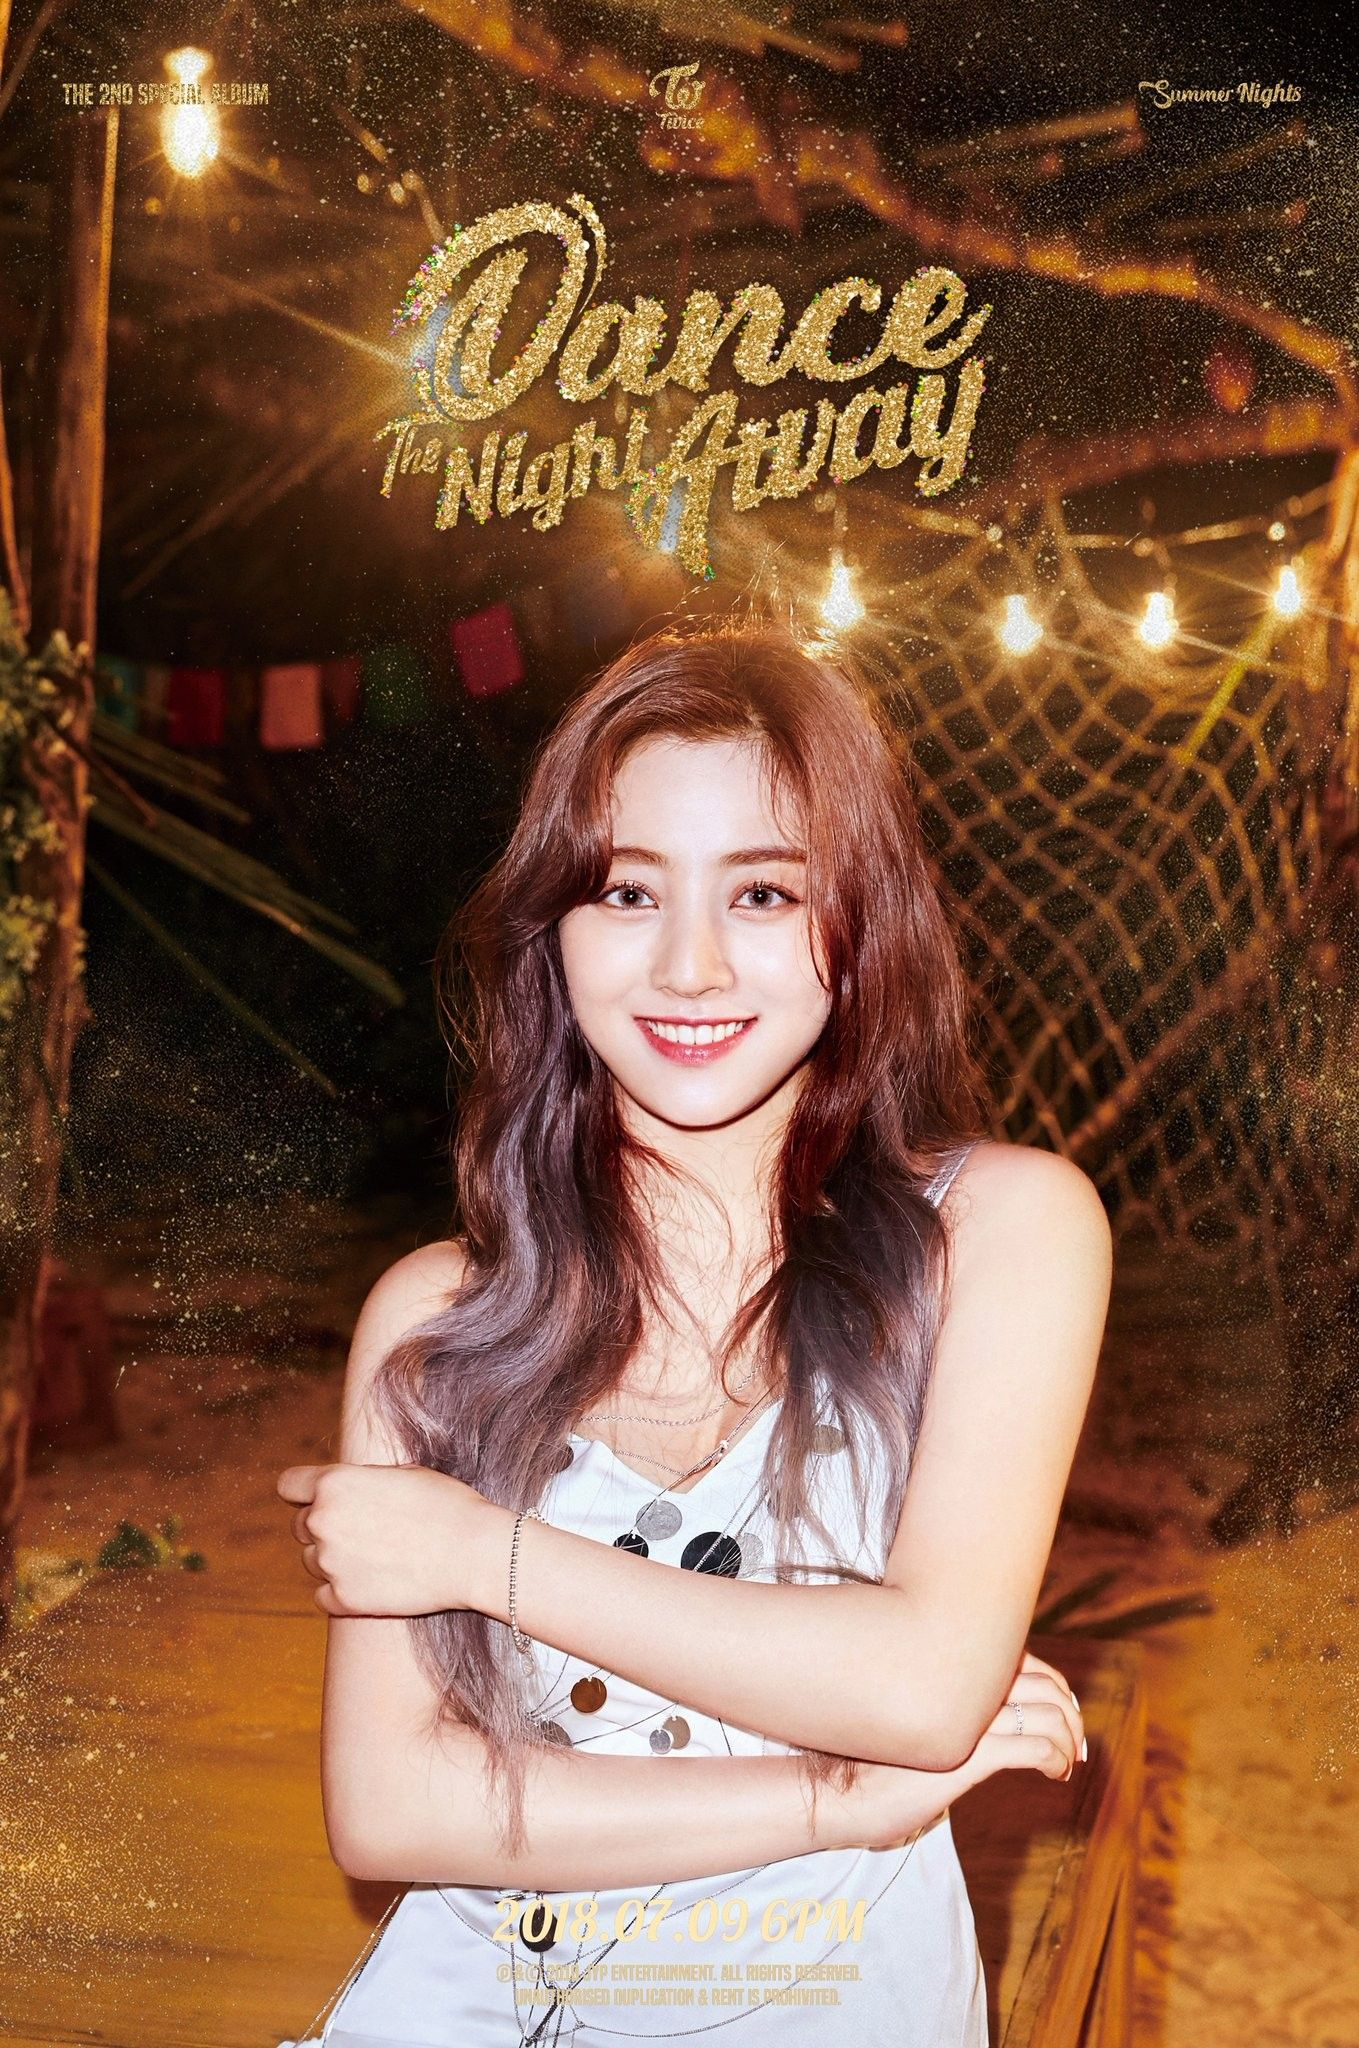 Twice Jihyo Summer Night Dance The Night Away Dance The Night